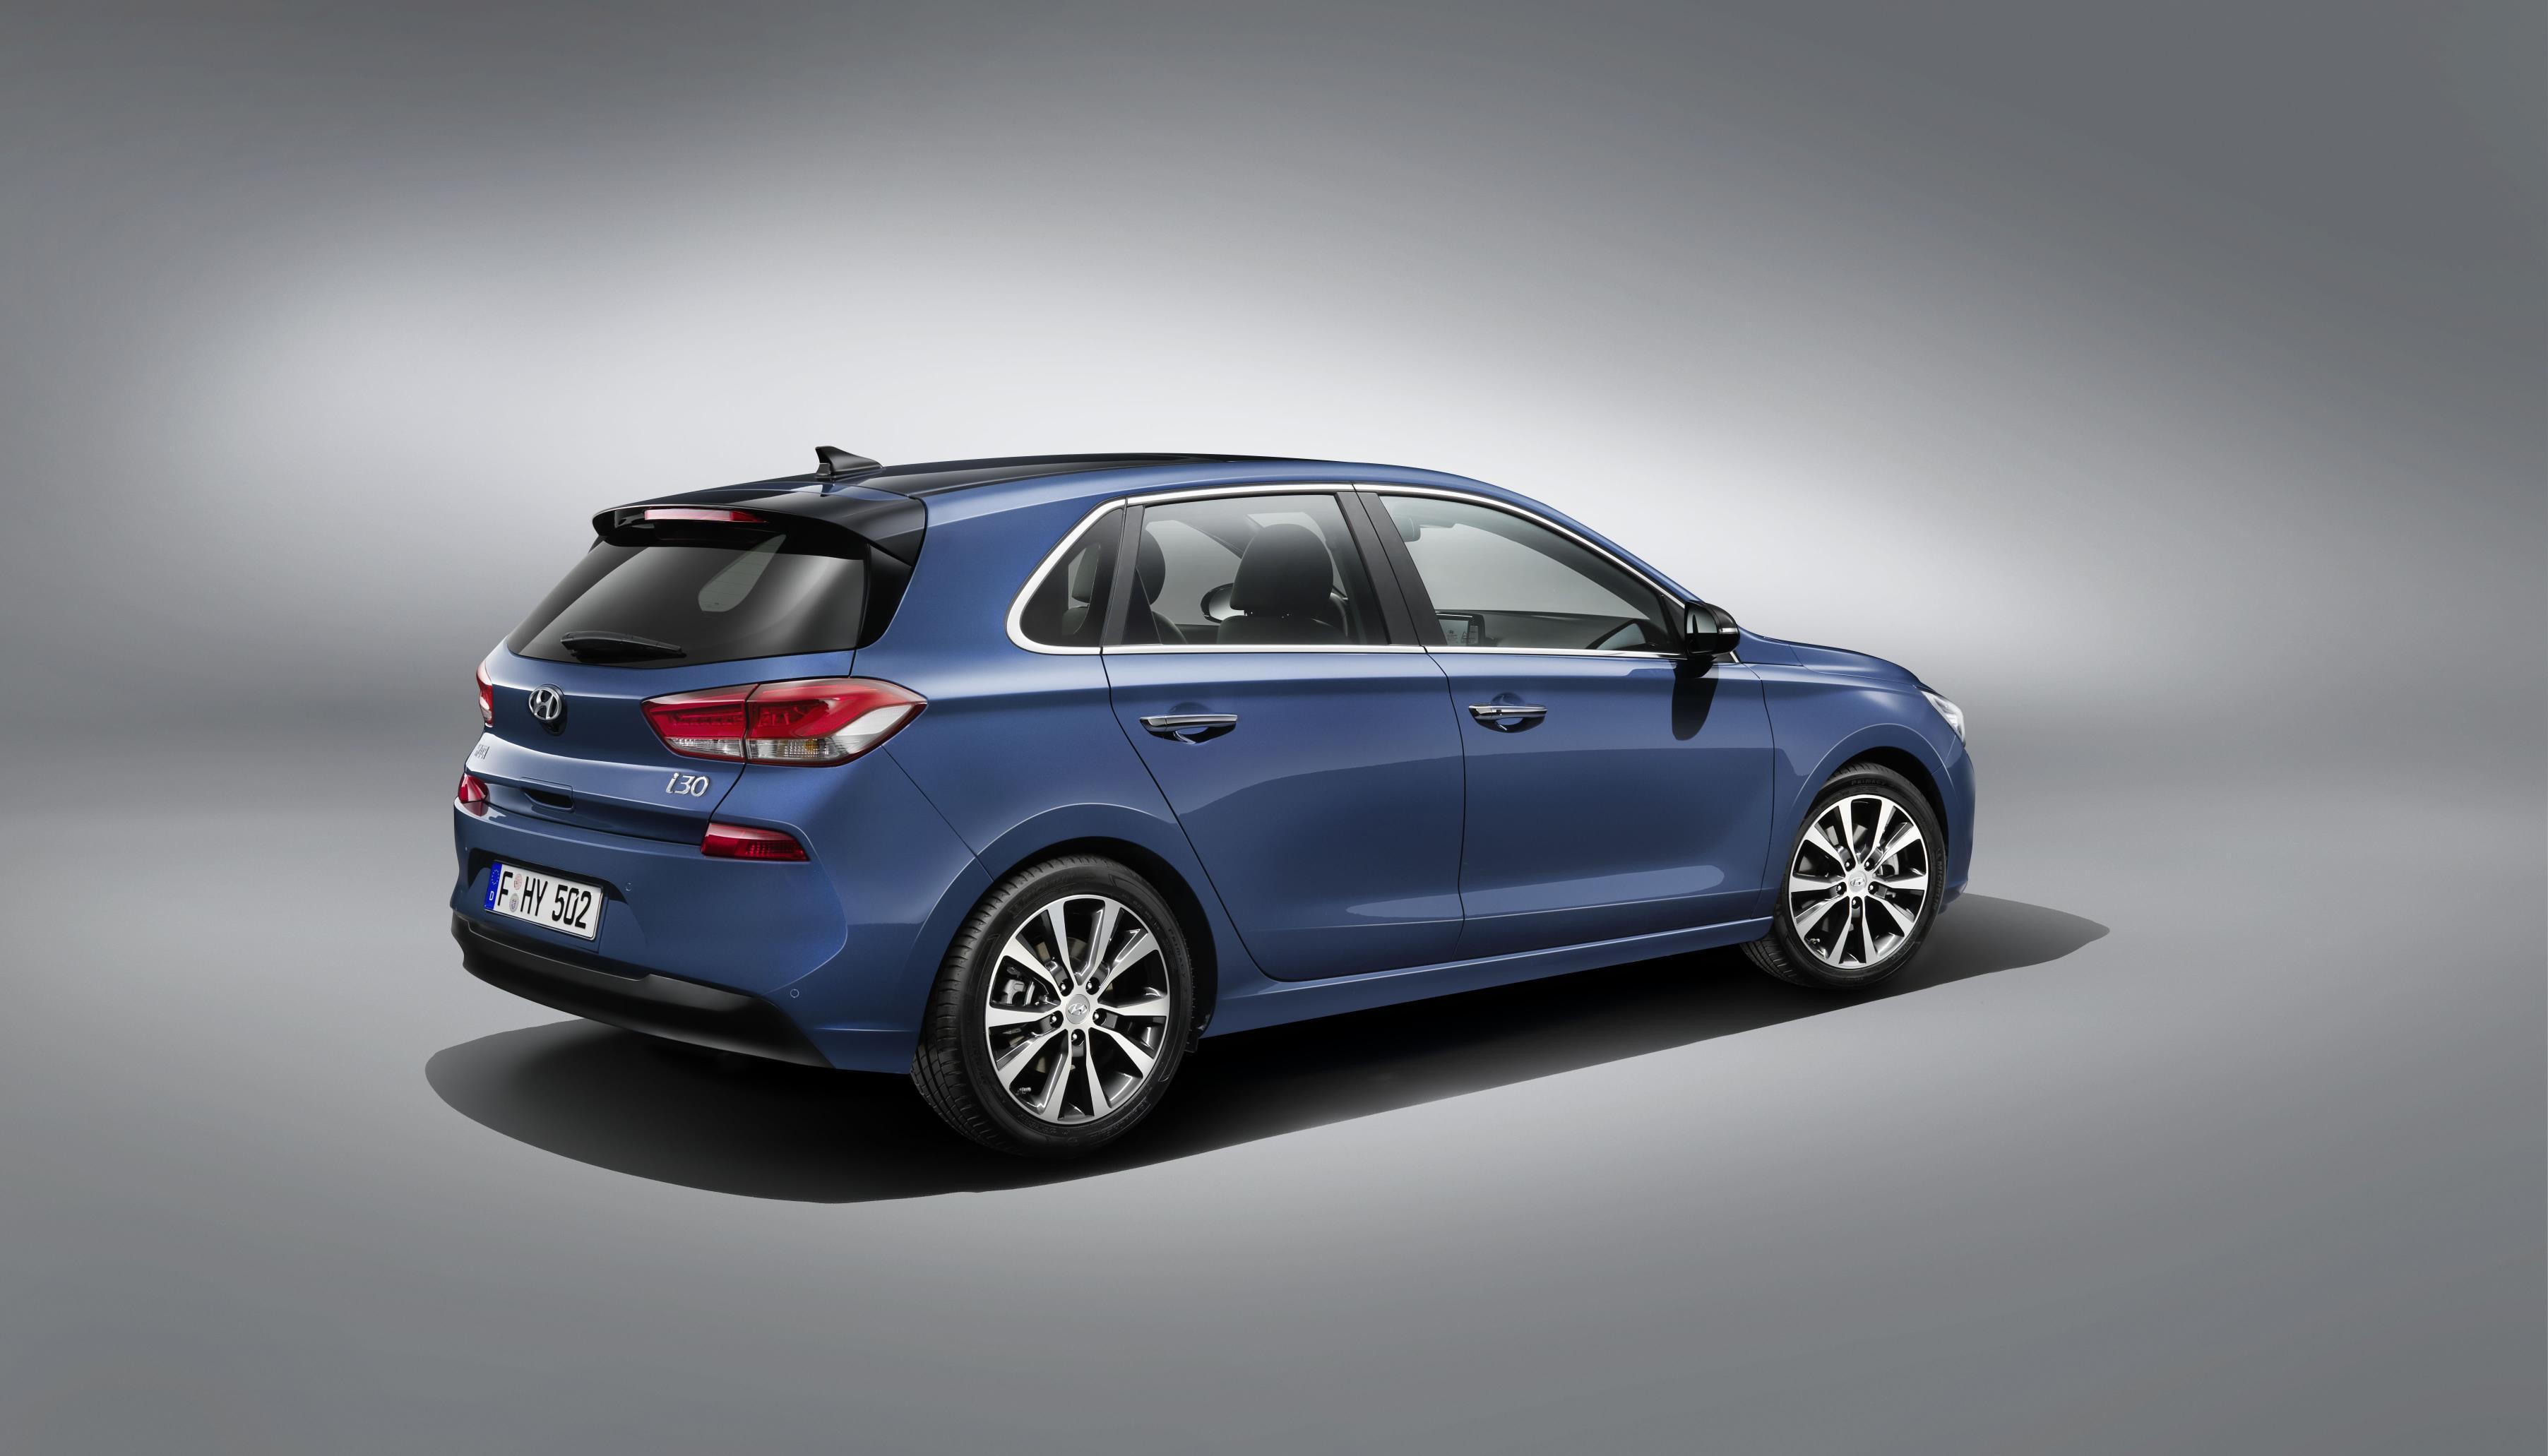 2018 hyundai hatchback. wonderful hatchback 2017 hyundai i30 intended 2018 hyundai hatchback